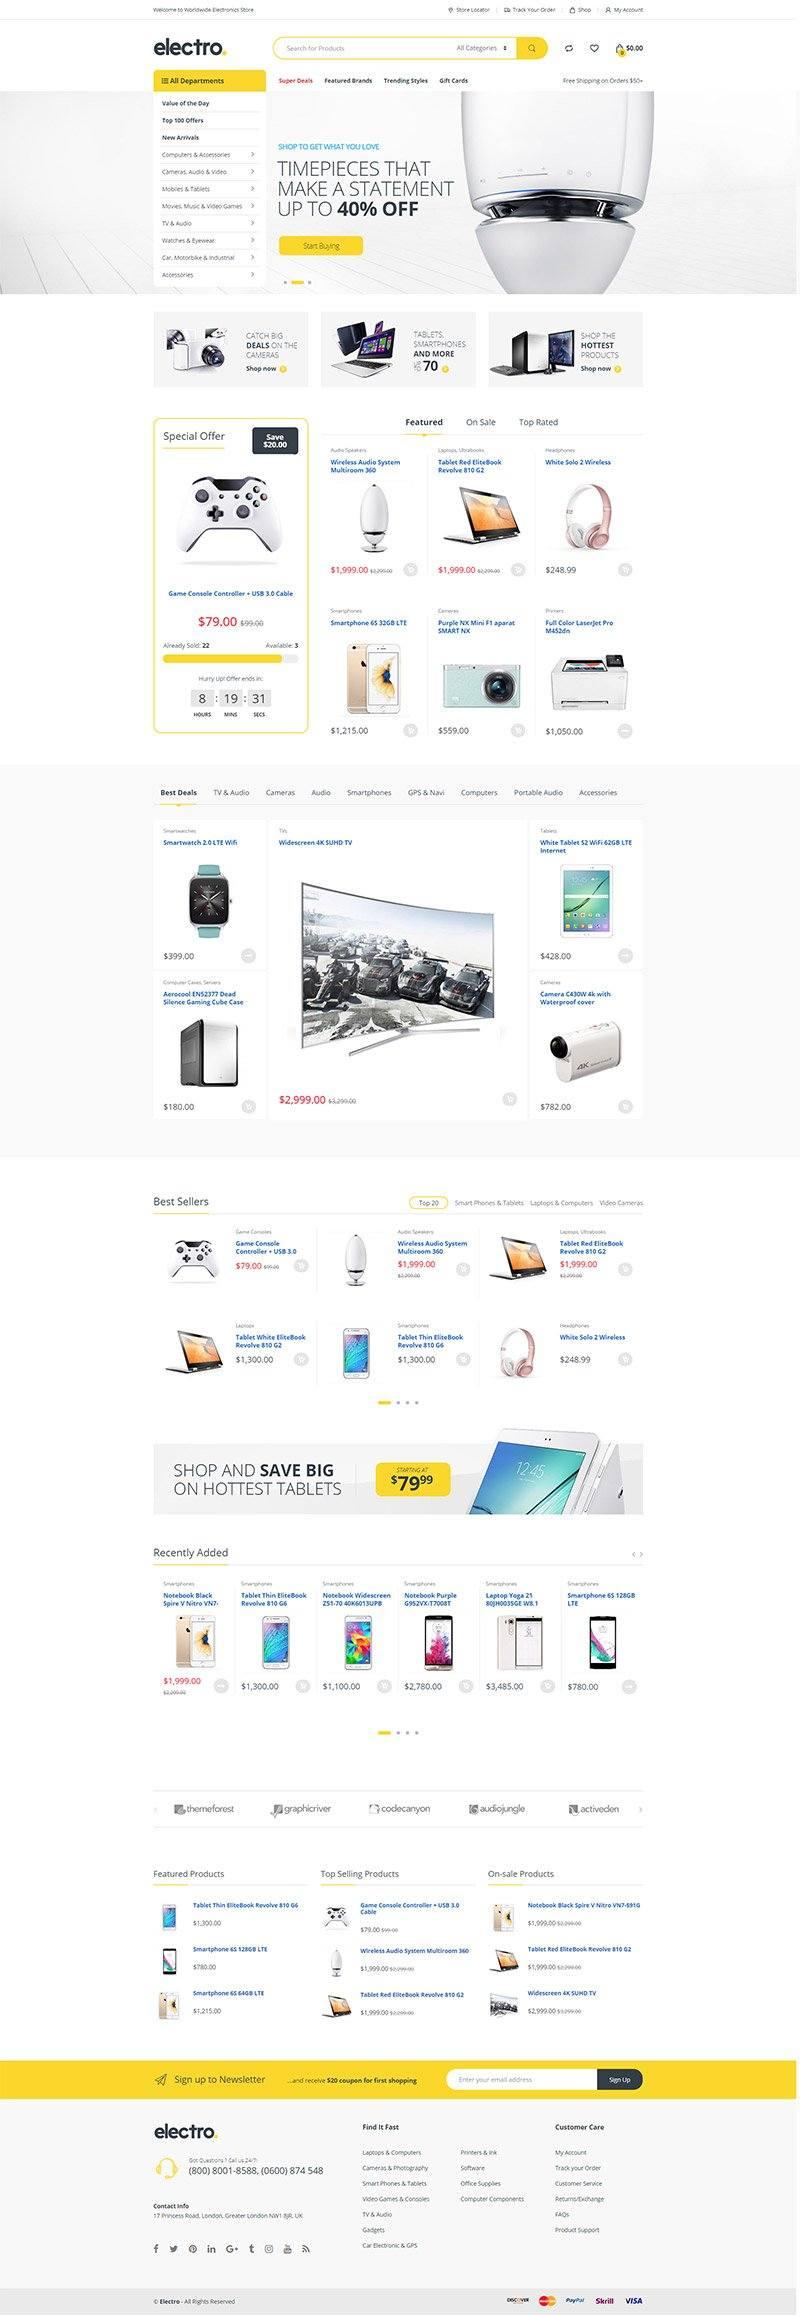 Giao-dien-website-thuong-mai-dien-tu-electro